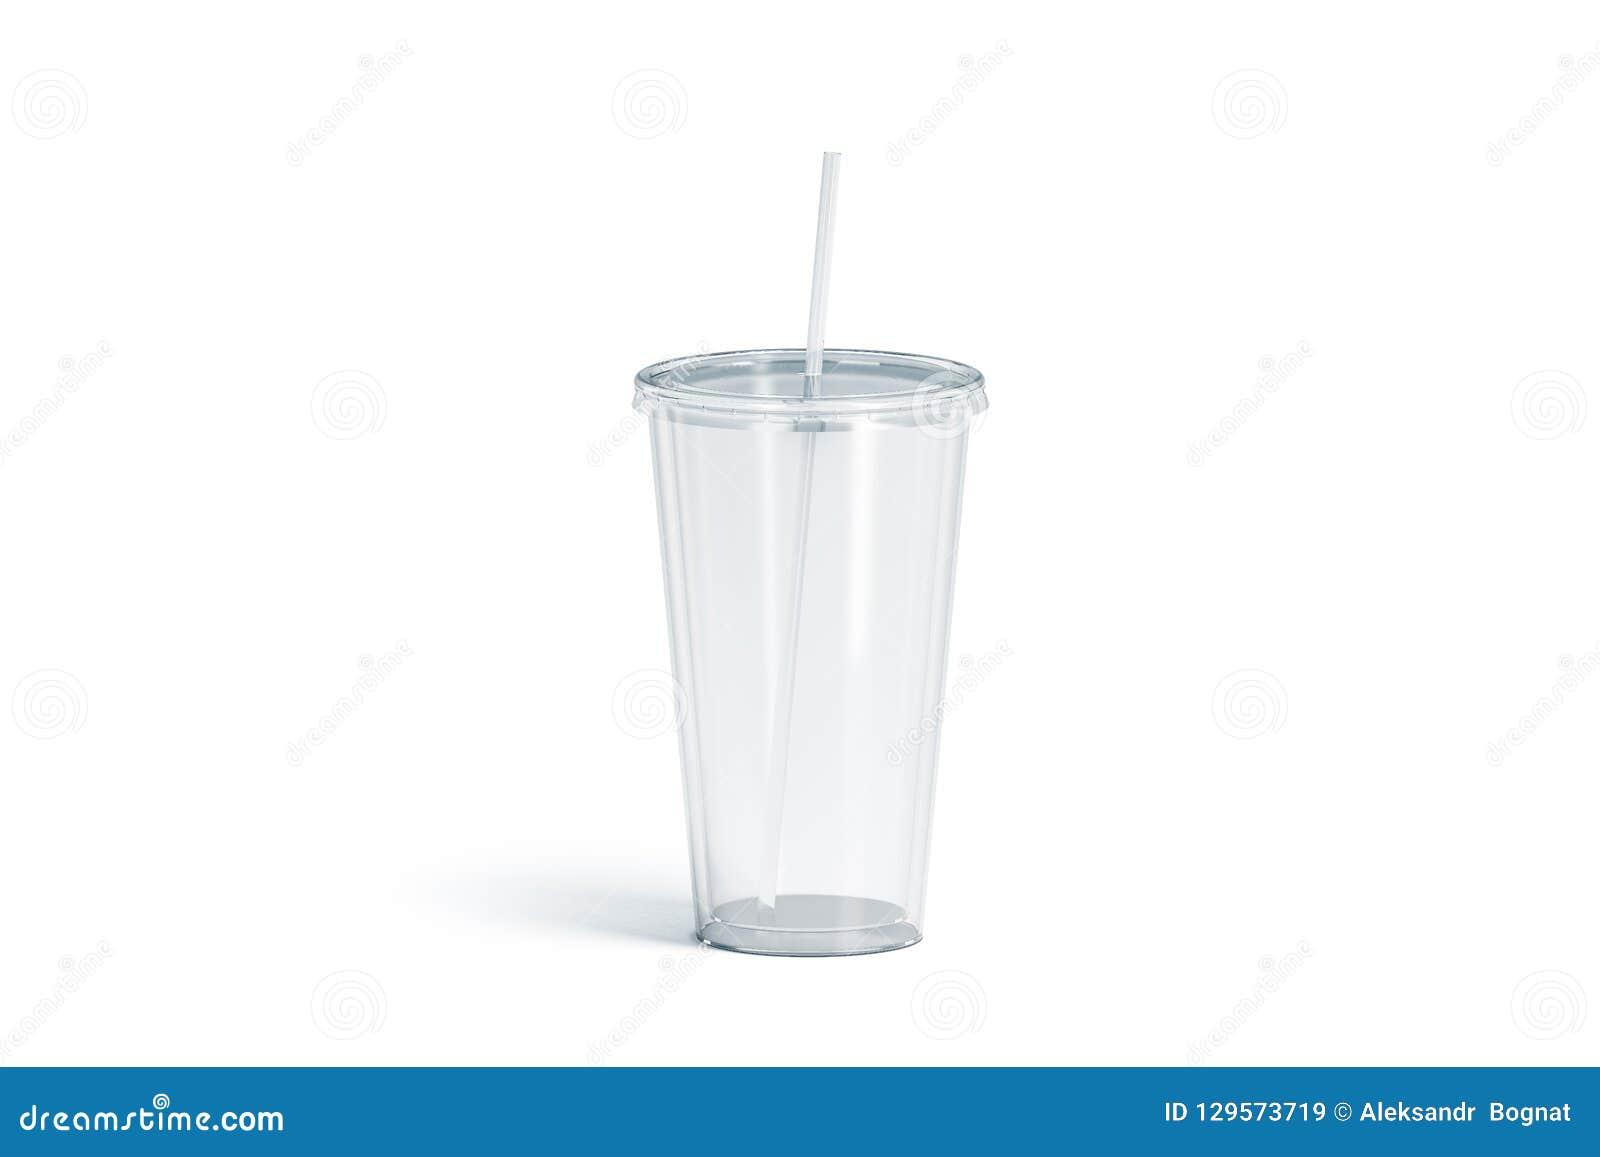 Blank White Transparent Acrylic Tumbler With Straw Mockup